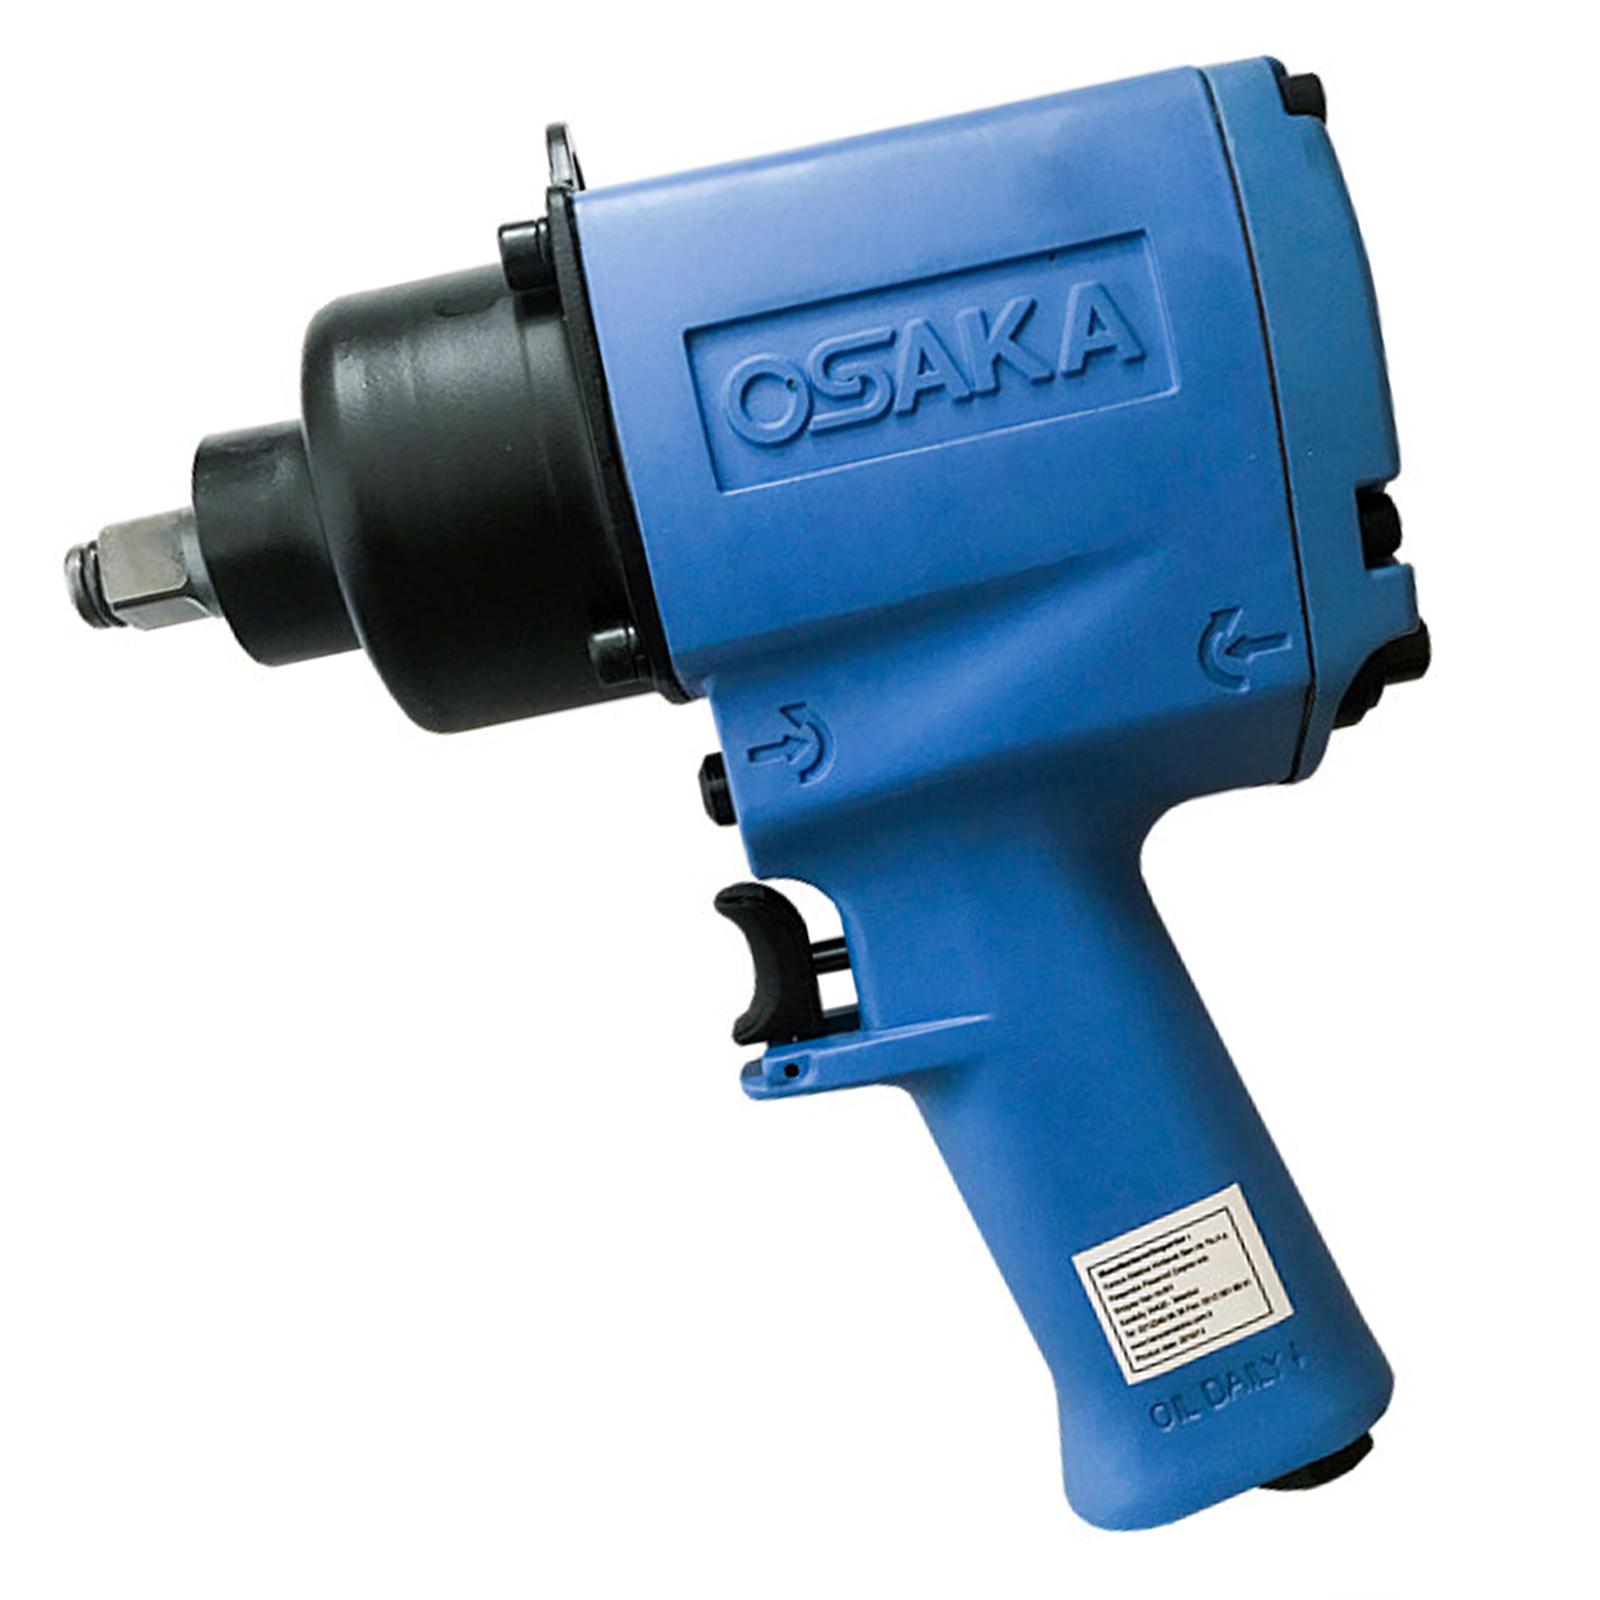 آچار بکس بادی اوساکا مدل OPTT517ODKK کد 0049